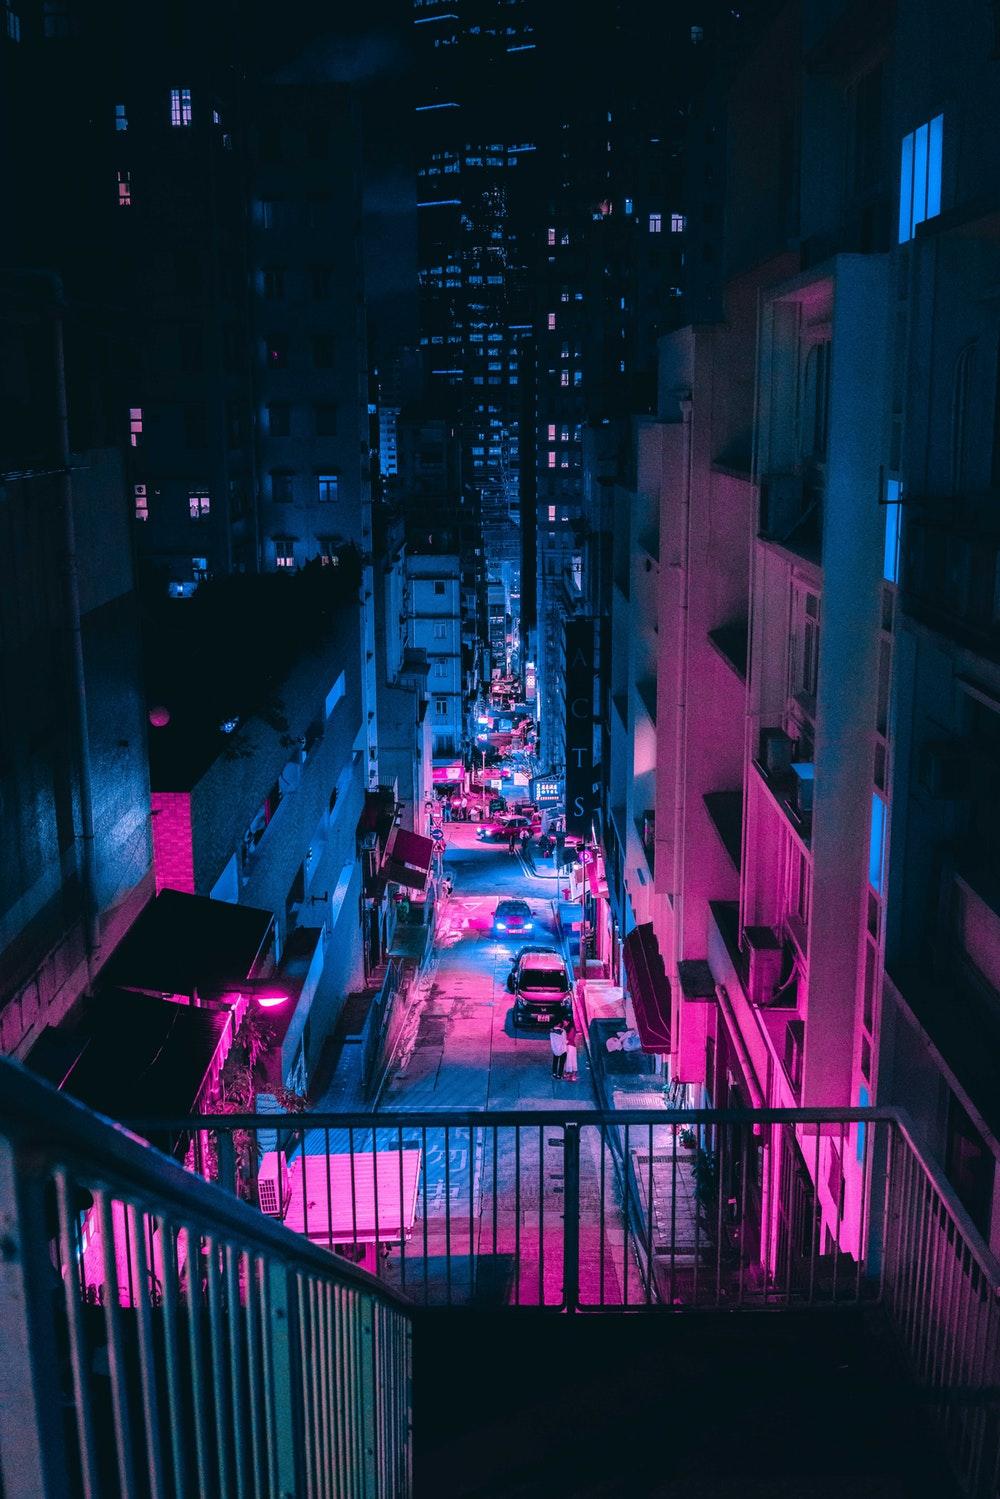 Steve Roe Vaporwave Cyberpunk Photography Pink And Blue Neon 818x1226 Download Hd Wallpaper Wallpapertip